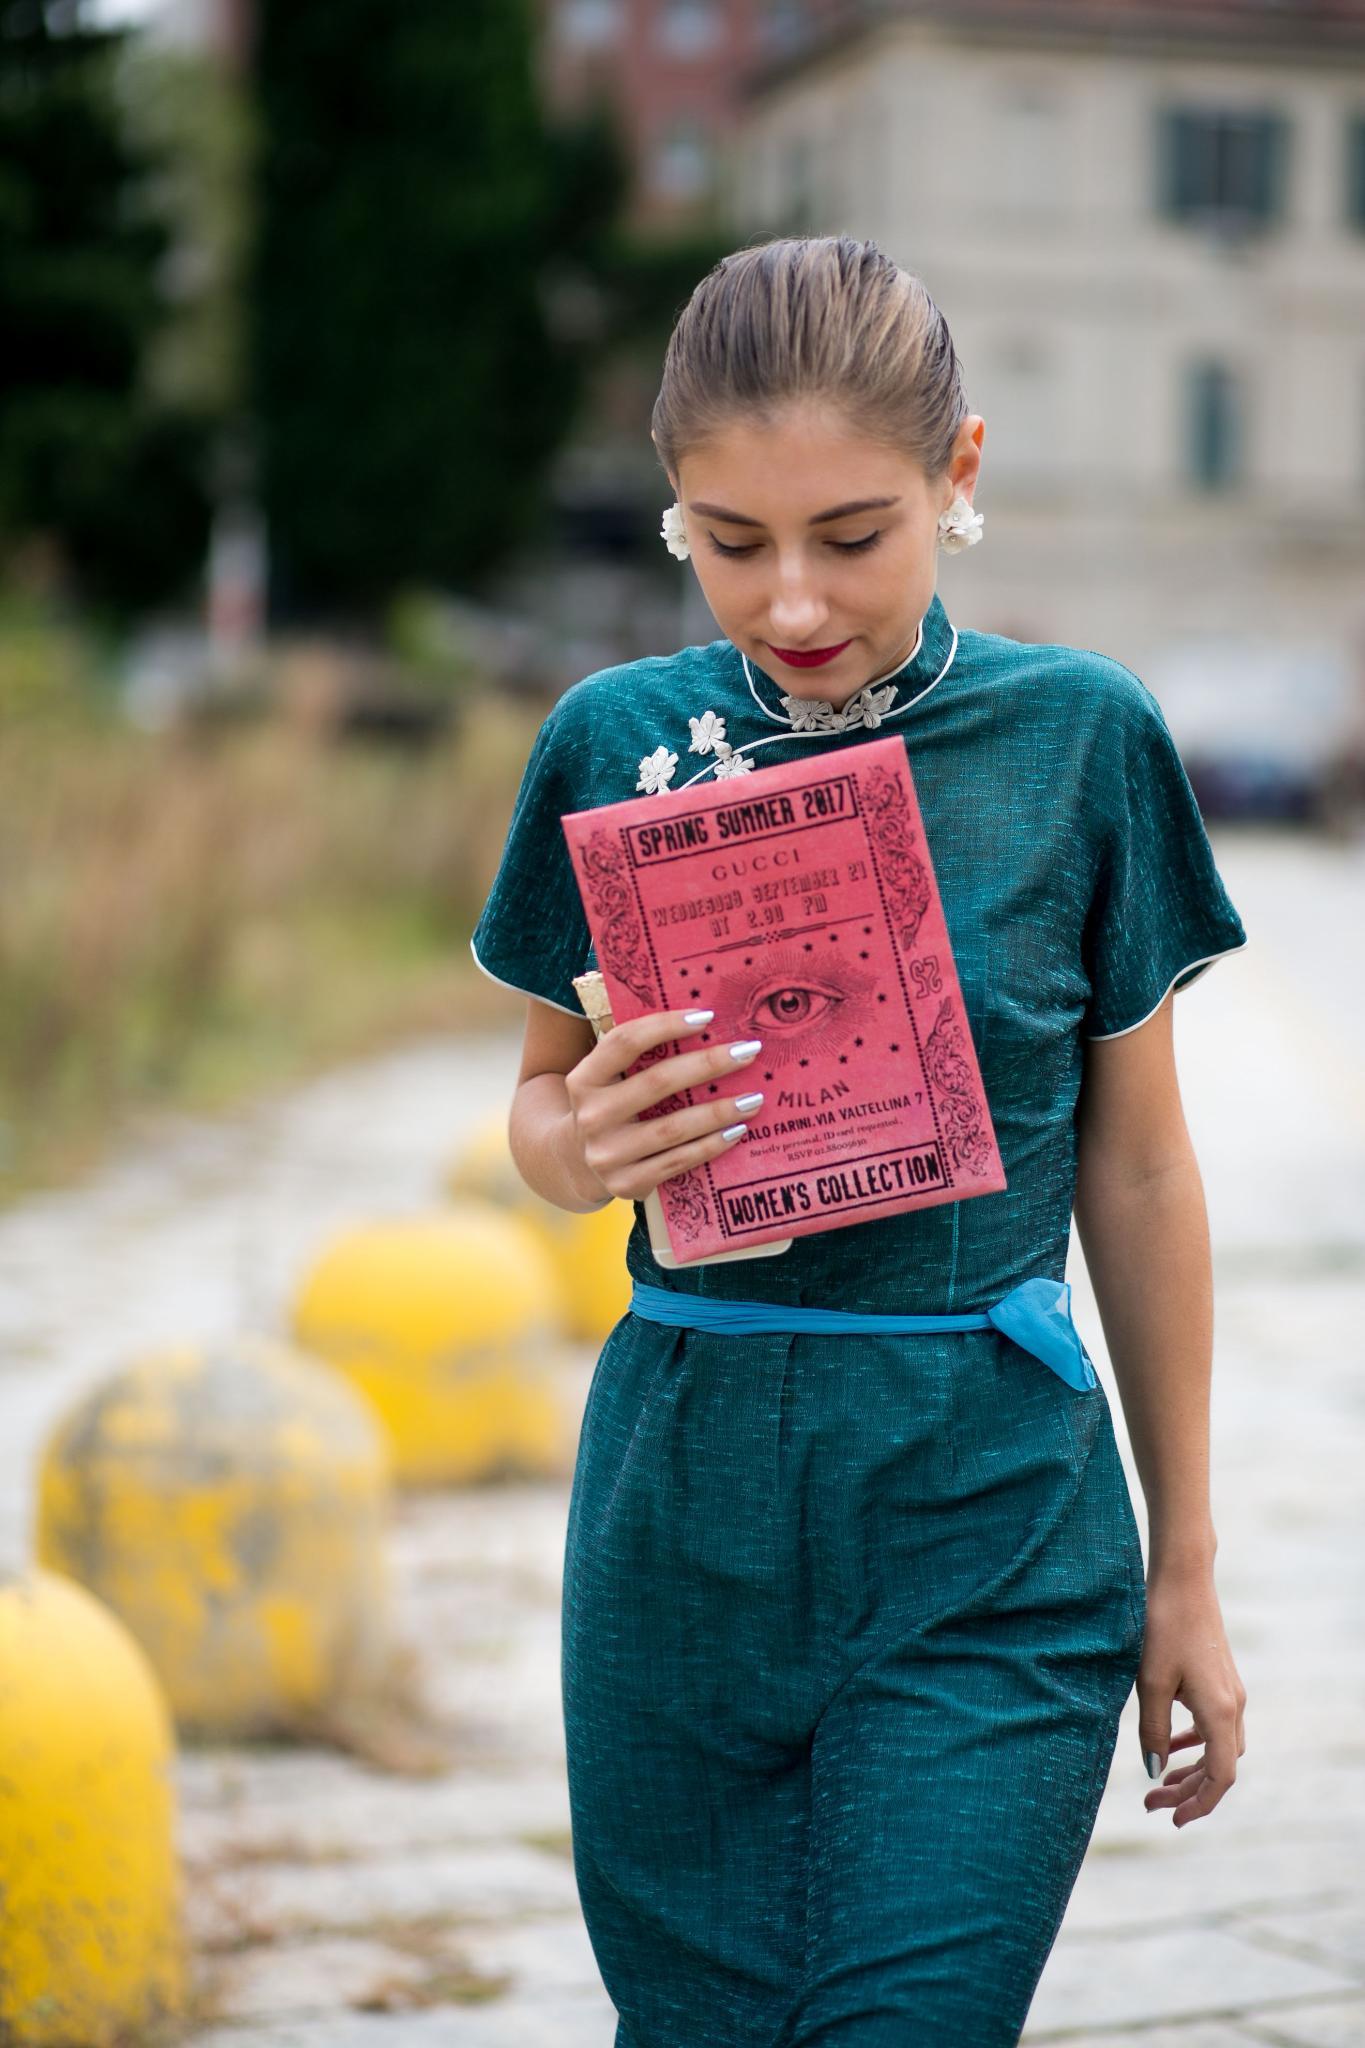 Short cuts: Beautiful young woman with a sleek bun at Fashion Week